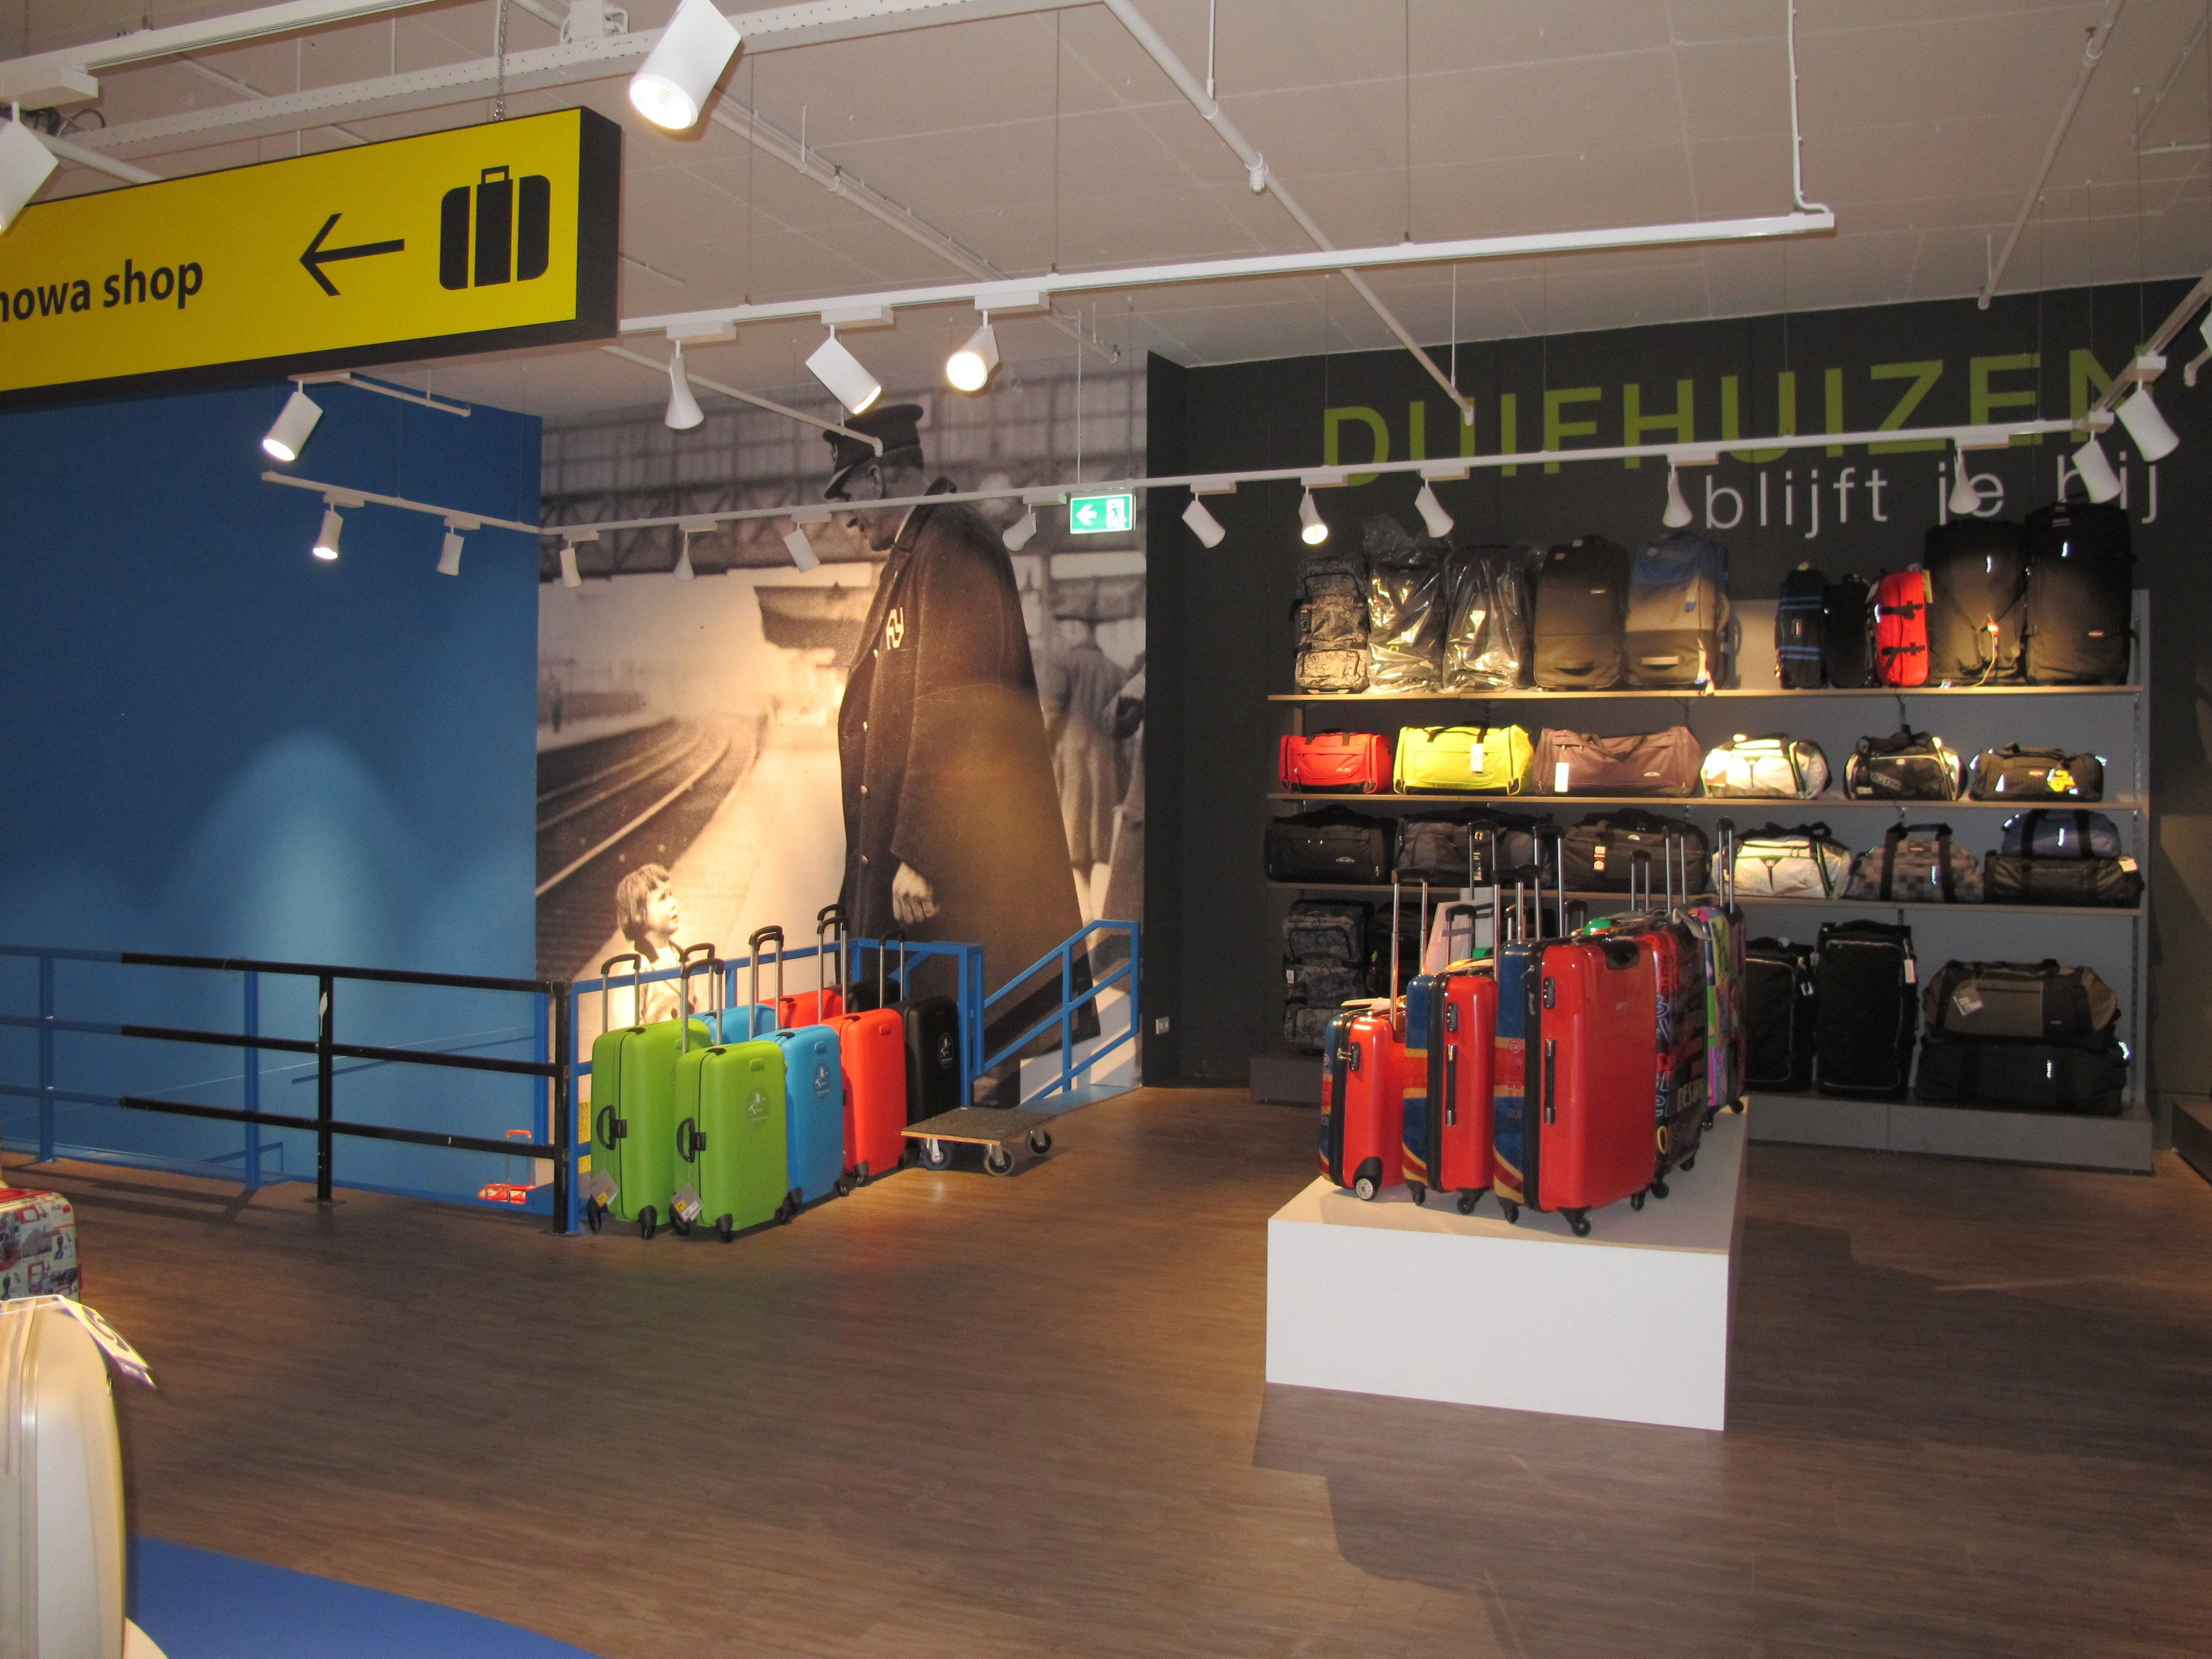 Samsonite Range Duifhuizen Shops Ridderkerk Large At Rimowa And XkZwOuTlPi